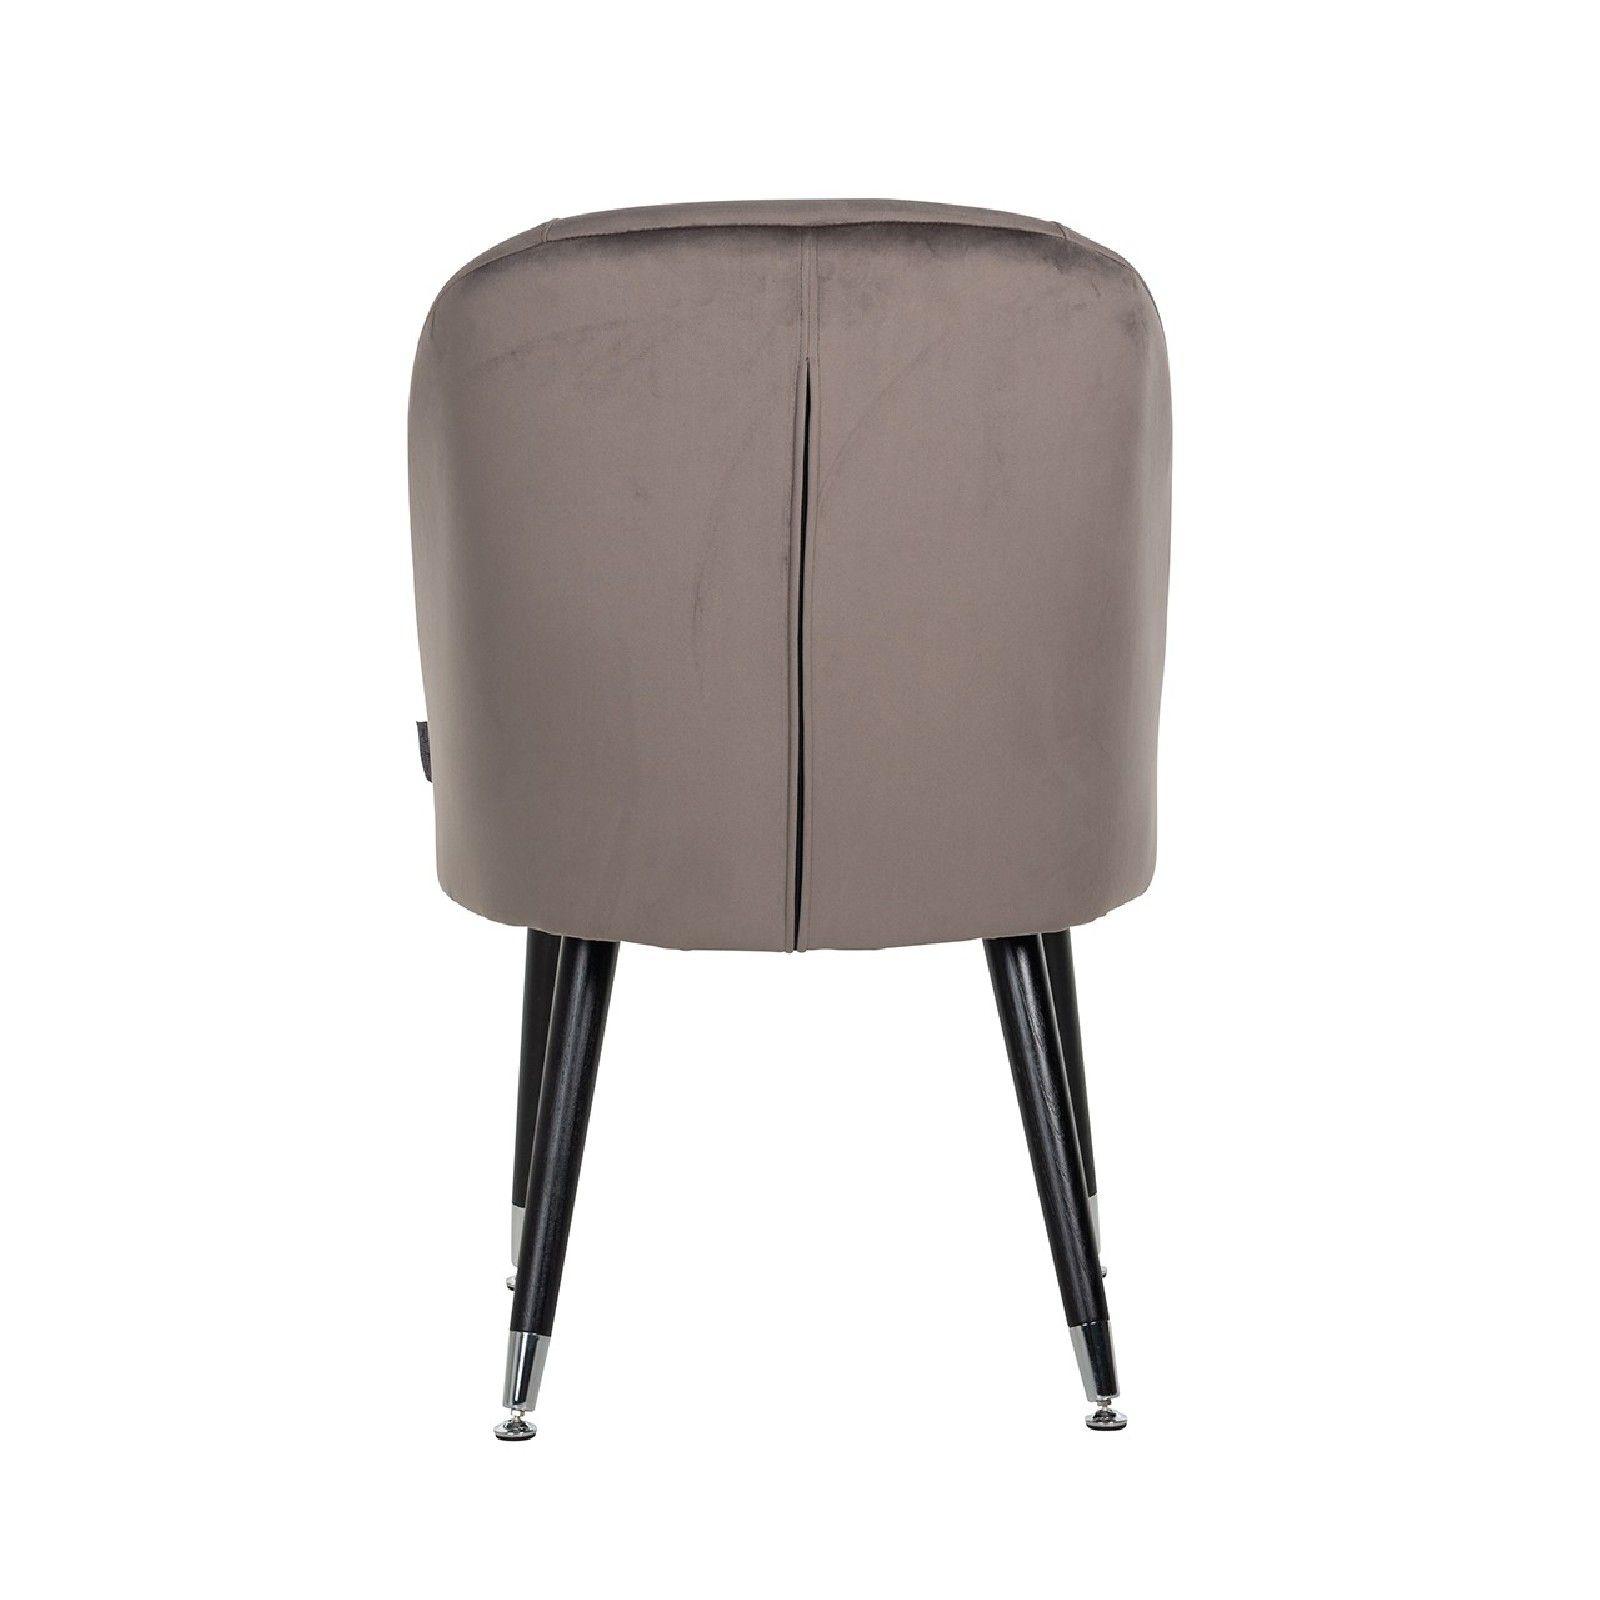 Chaise Julius Stone Velvet, Silver footcap Salle à manger - 51